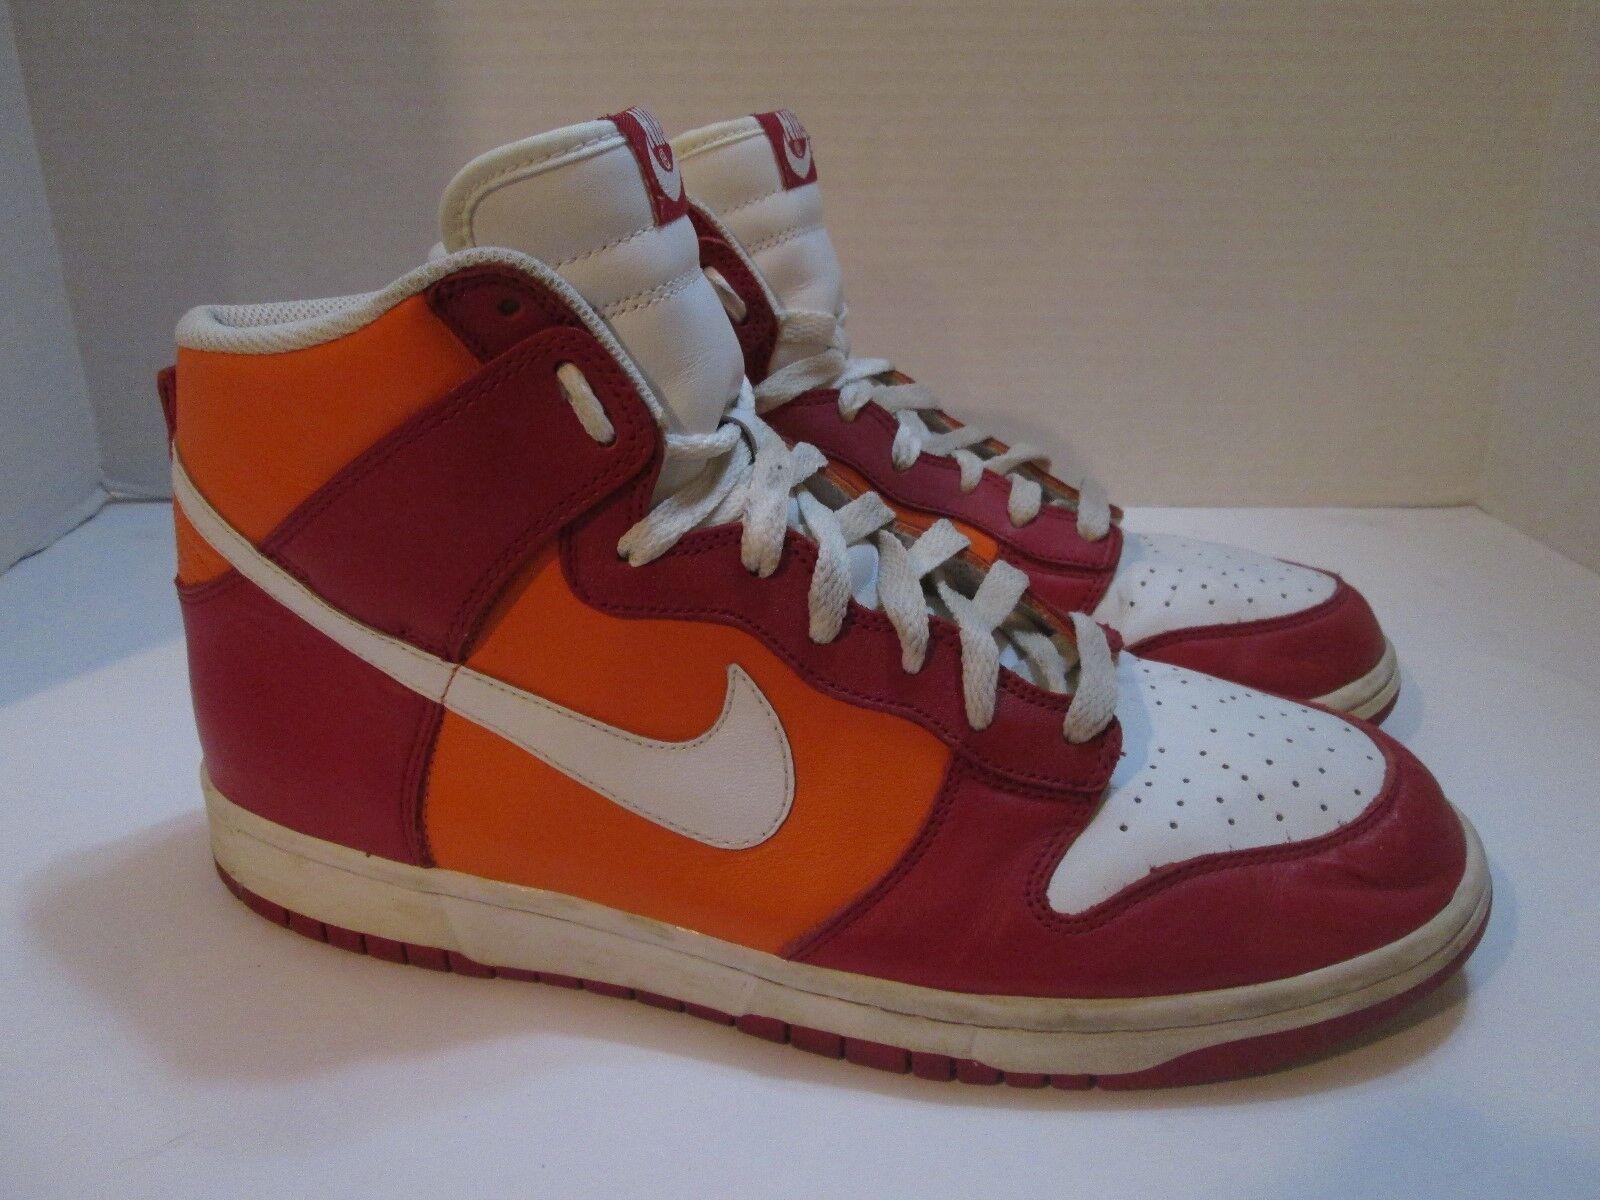 Nike Men's Dunk Retro QS High Top Basketball Shoes White Orange Red Size 11